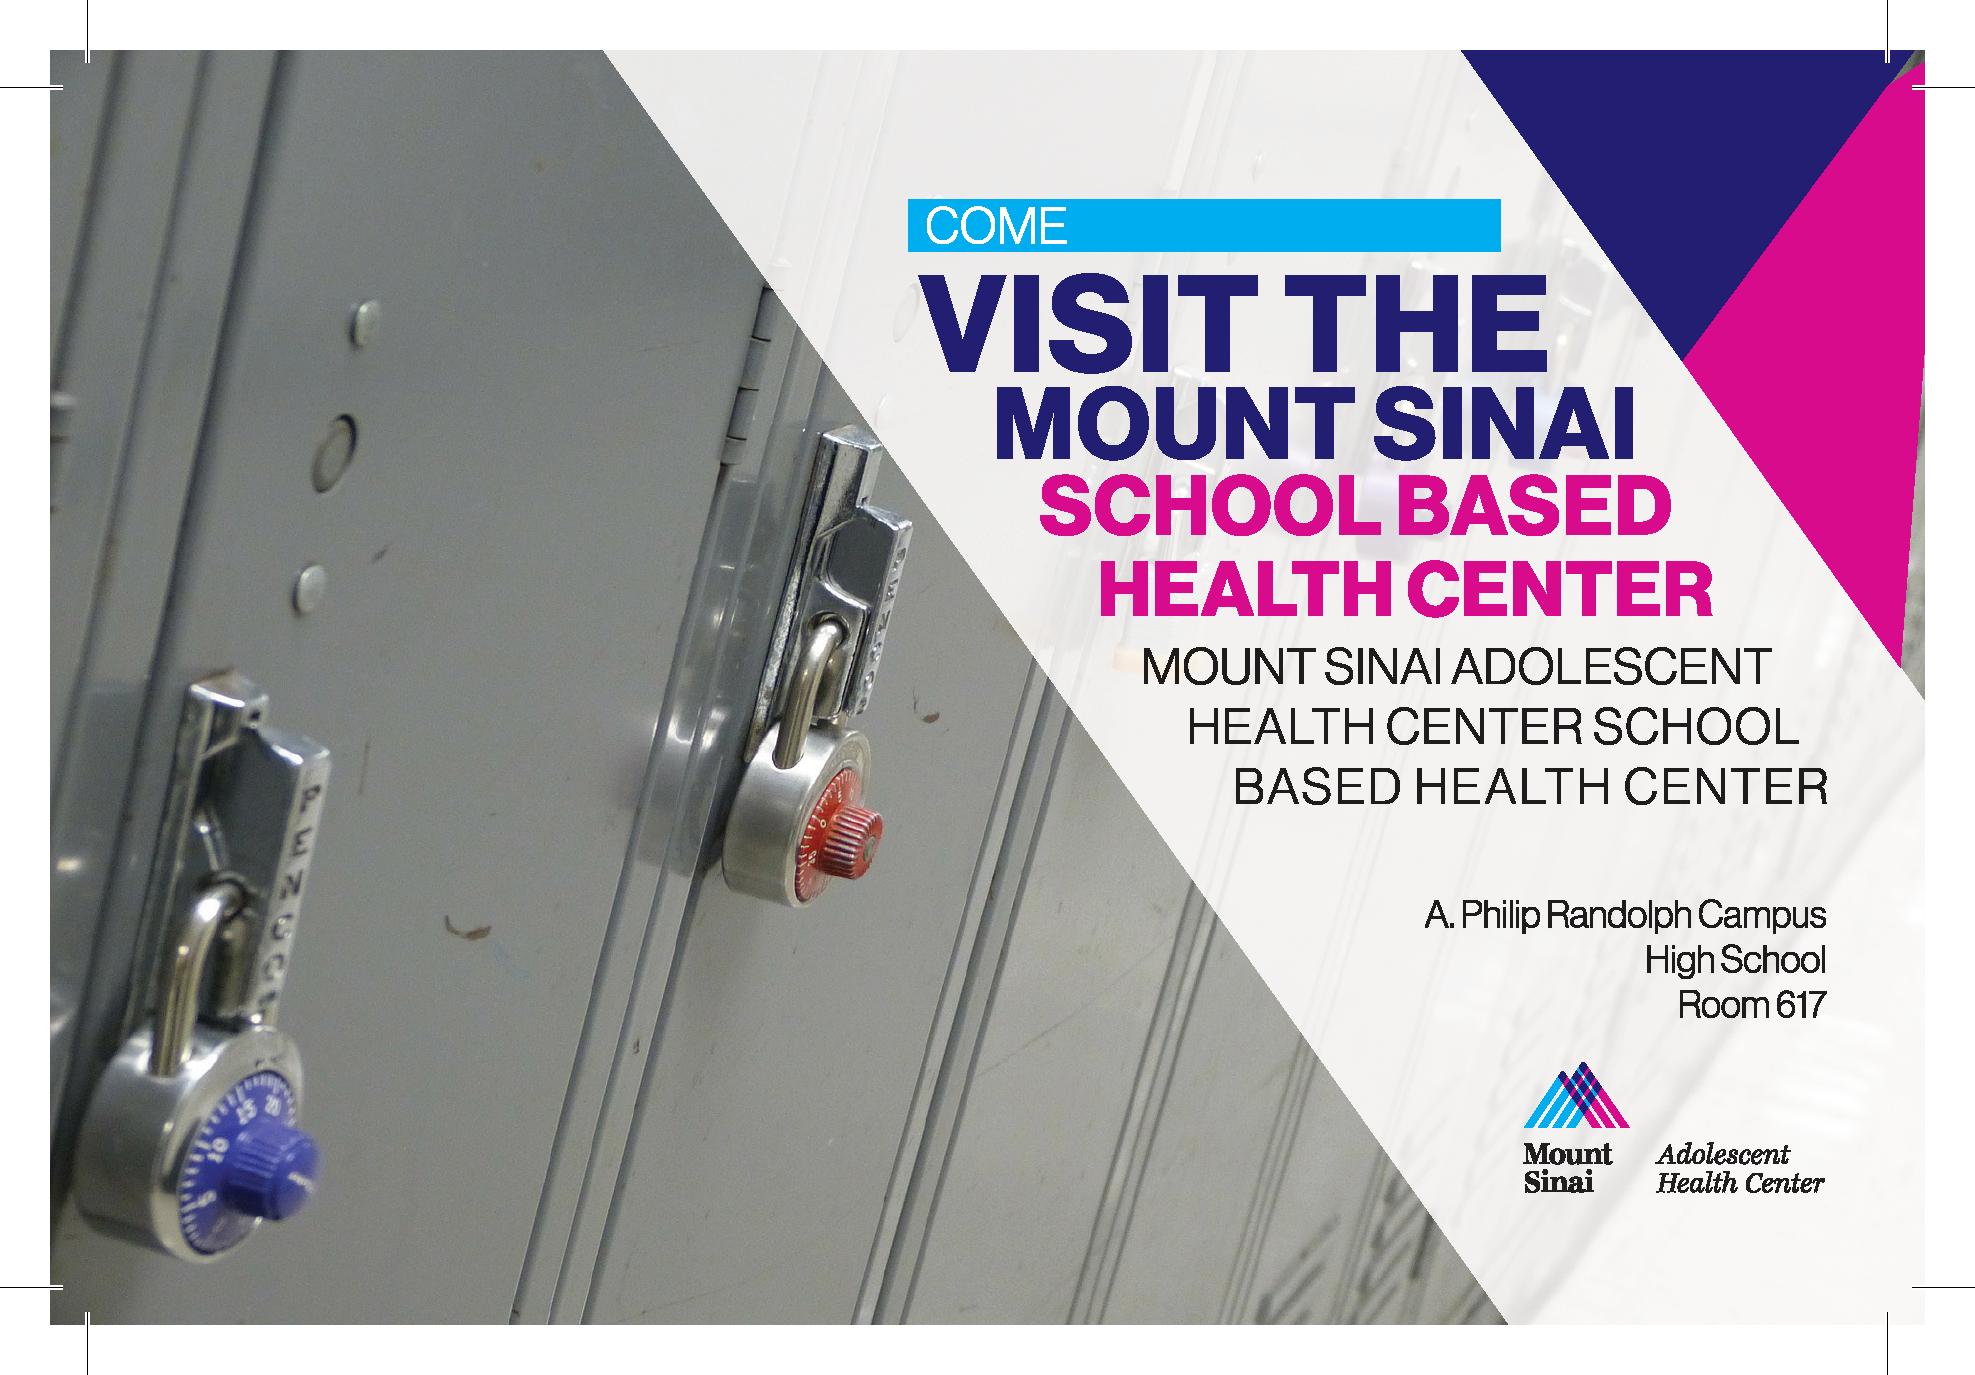 1005_A.Philip Randolph Campus_MSSBHC_School_Postcard_4x6_E144893-1